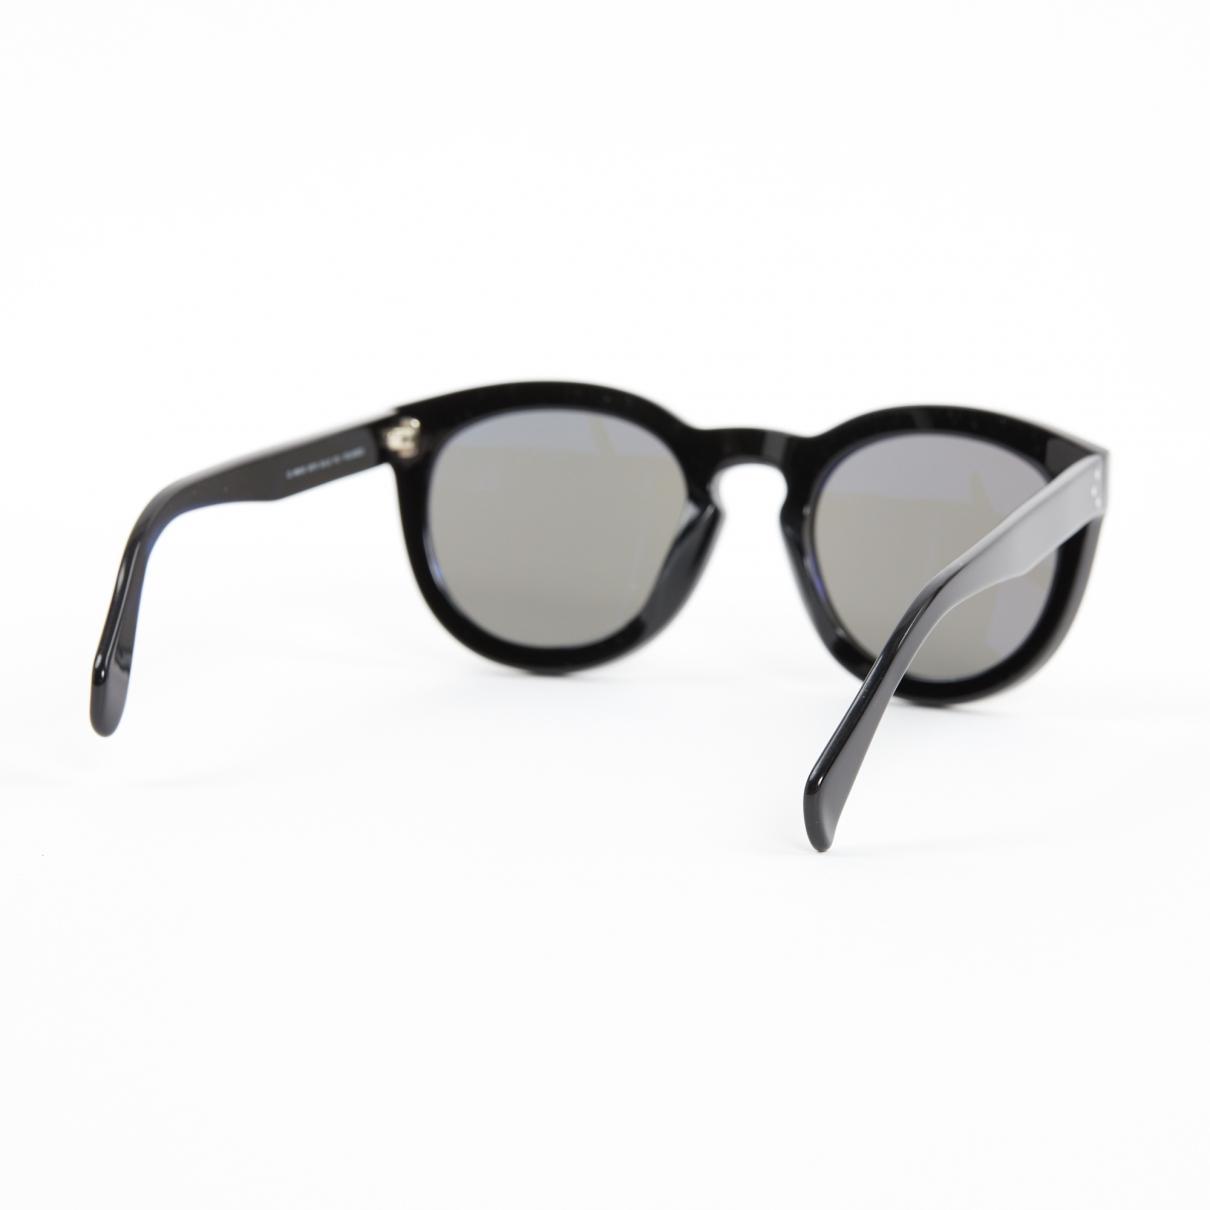 40ed26623e9 Céline - Black Oversized Sunglasses - Lyst. View fullscreen